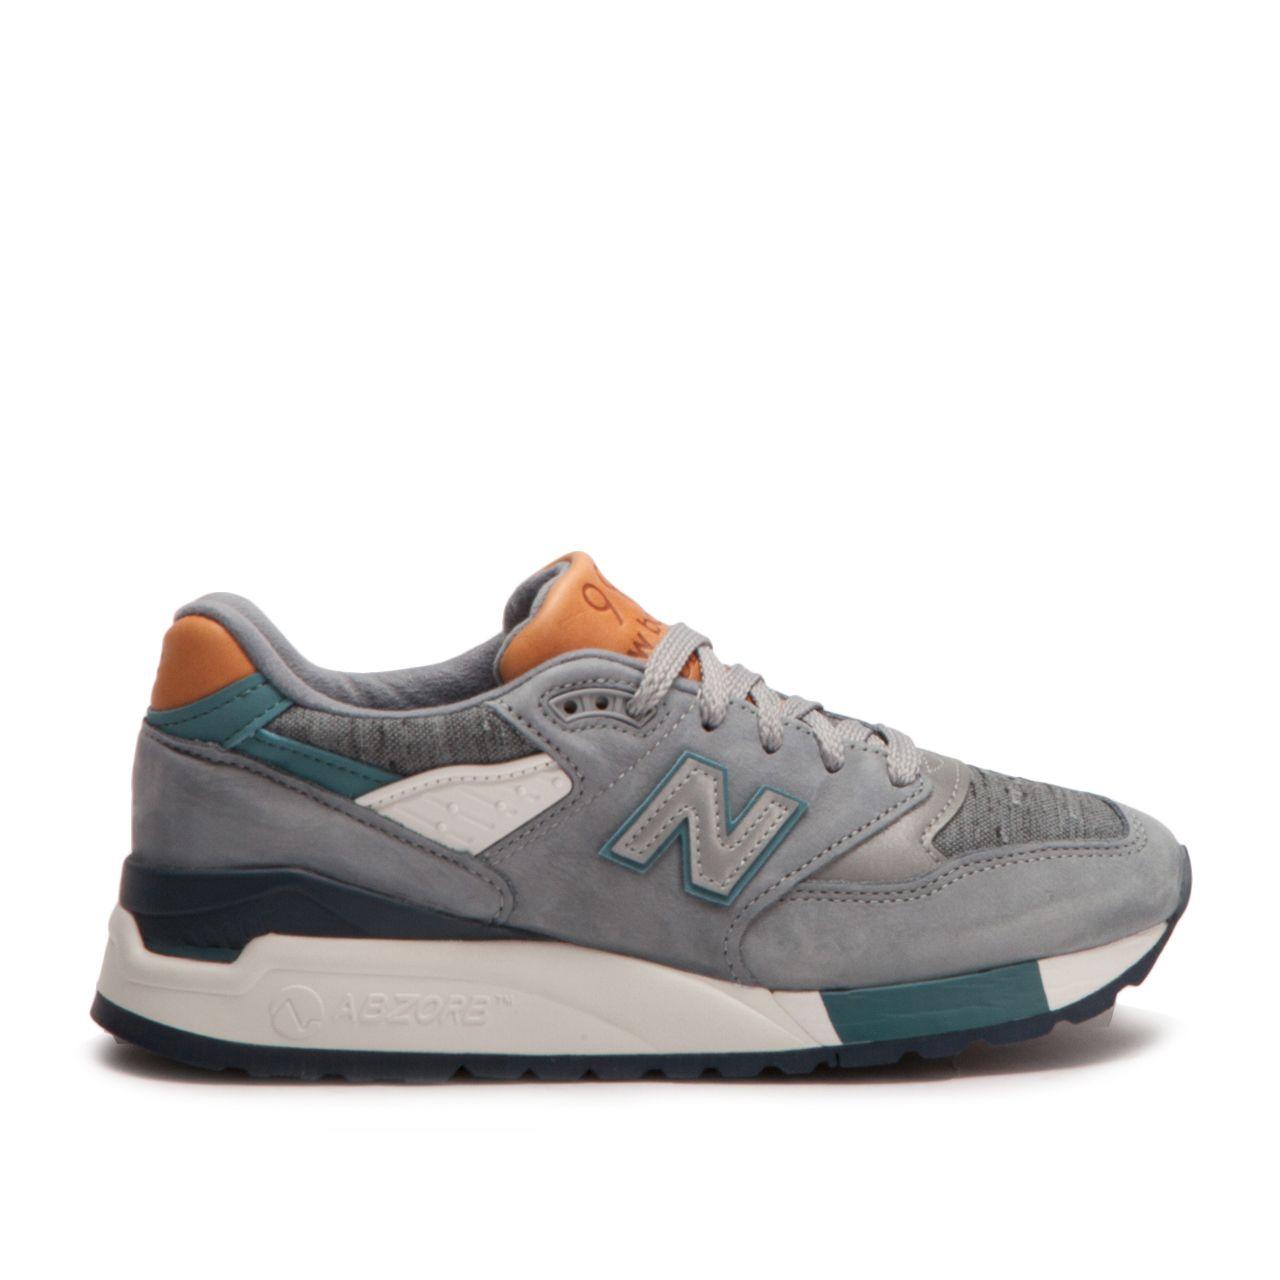 "37eea645ec9 New Balance W 998 DTV ""Made in USA"" (Stahlgrau) #lpu #sneaker ..."